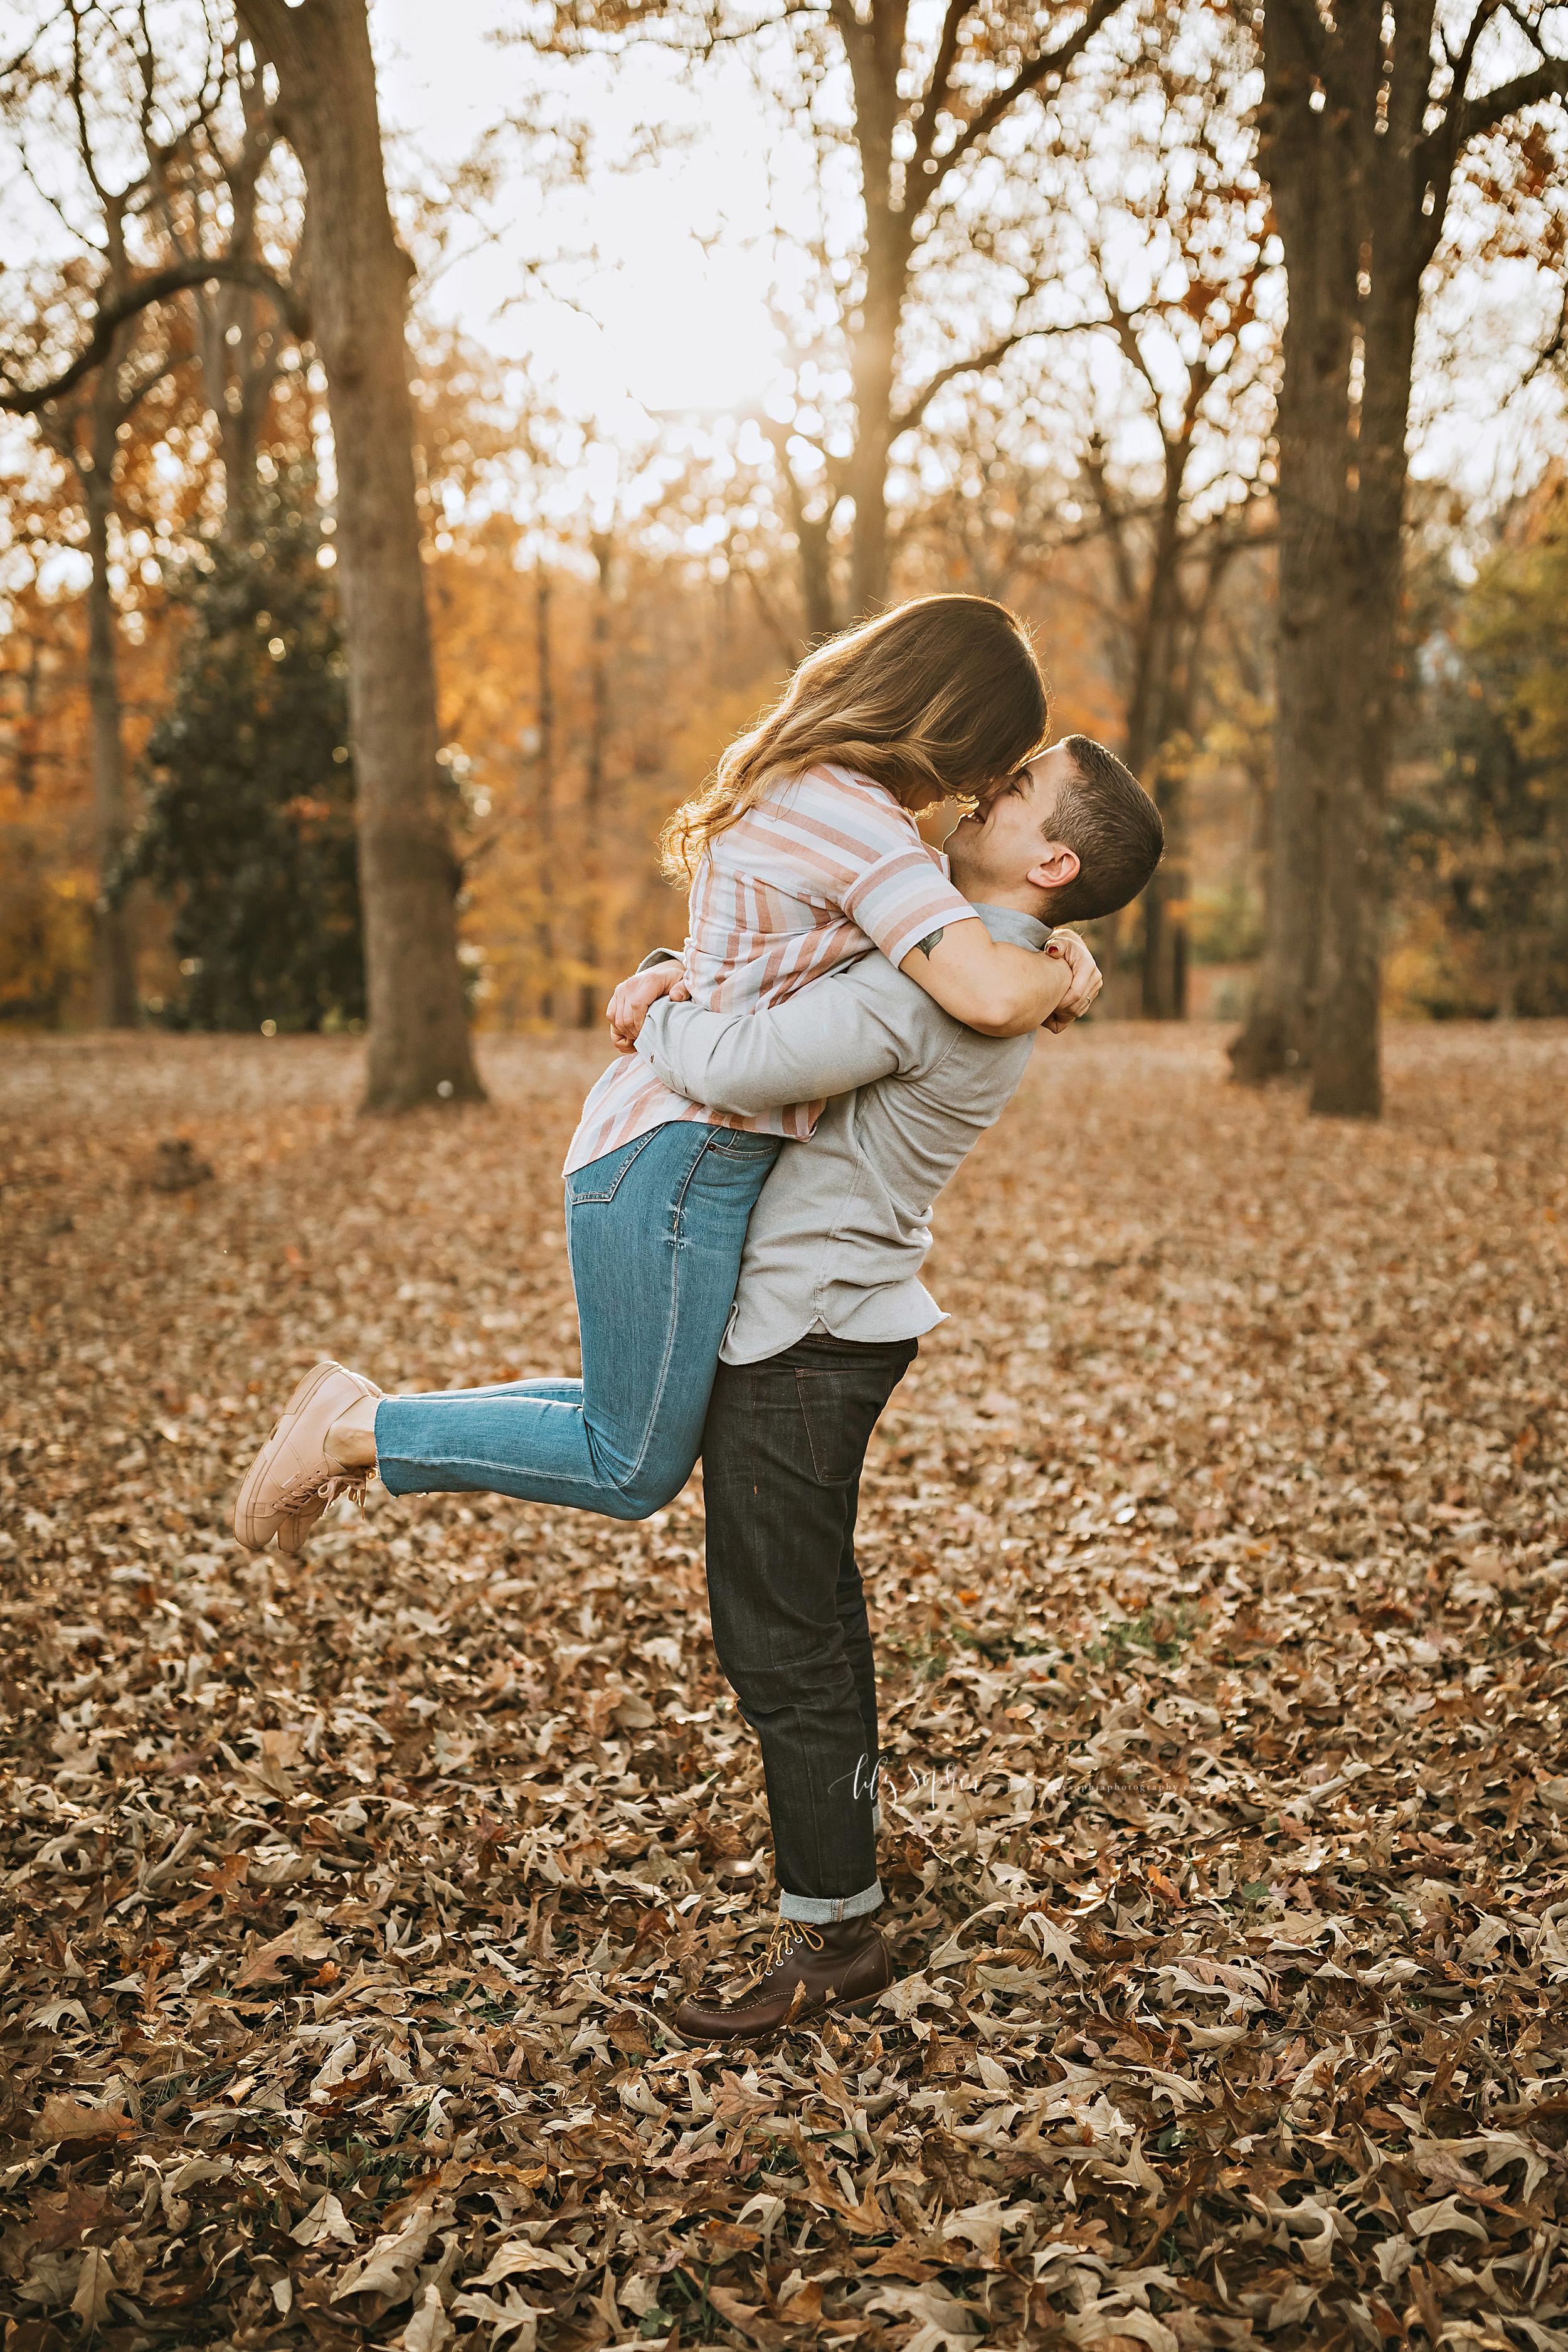 atlanta-reynoldstown-peoplestown-decatur-sandy-springs-buckhead-virginia-highlands-west-end-decatur-lily-sophia-photography-outdoor-fall-couples-photos_1476.jpg